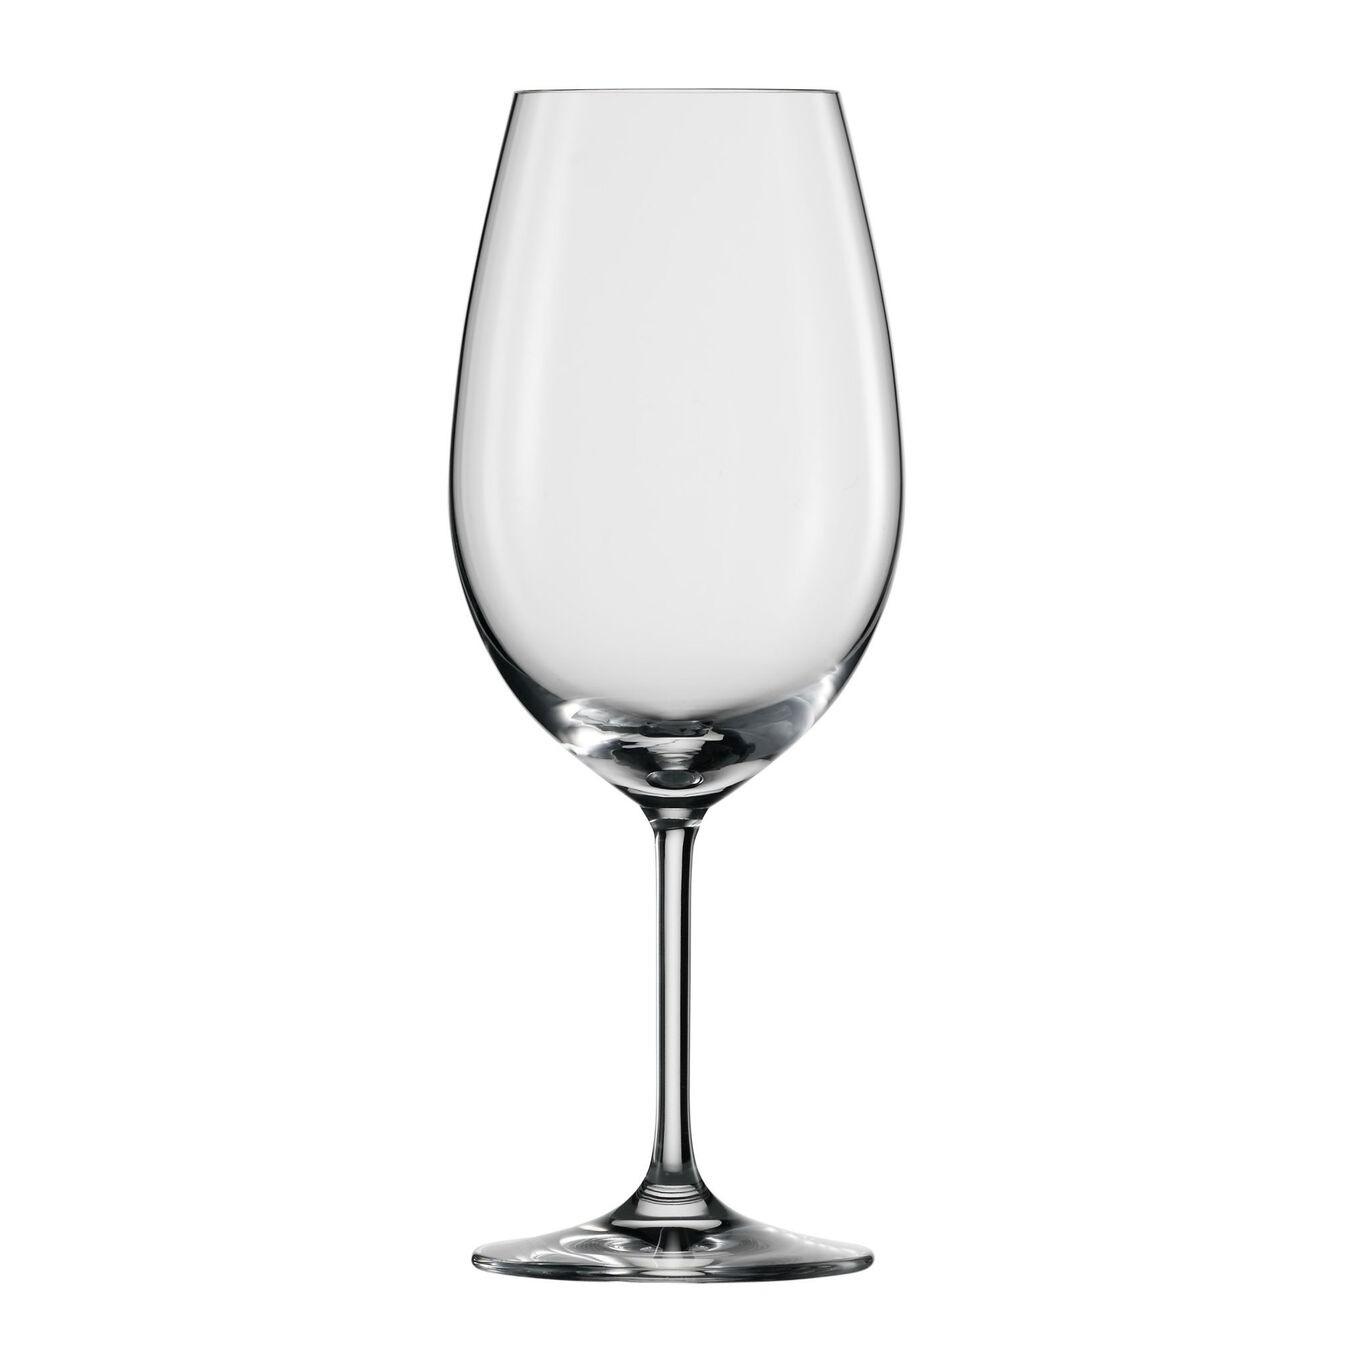 Conjunto Com 6 Taças Para Vinho Bordeaux 633 Ml  - Schott-Zwiesel Ivento